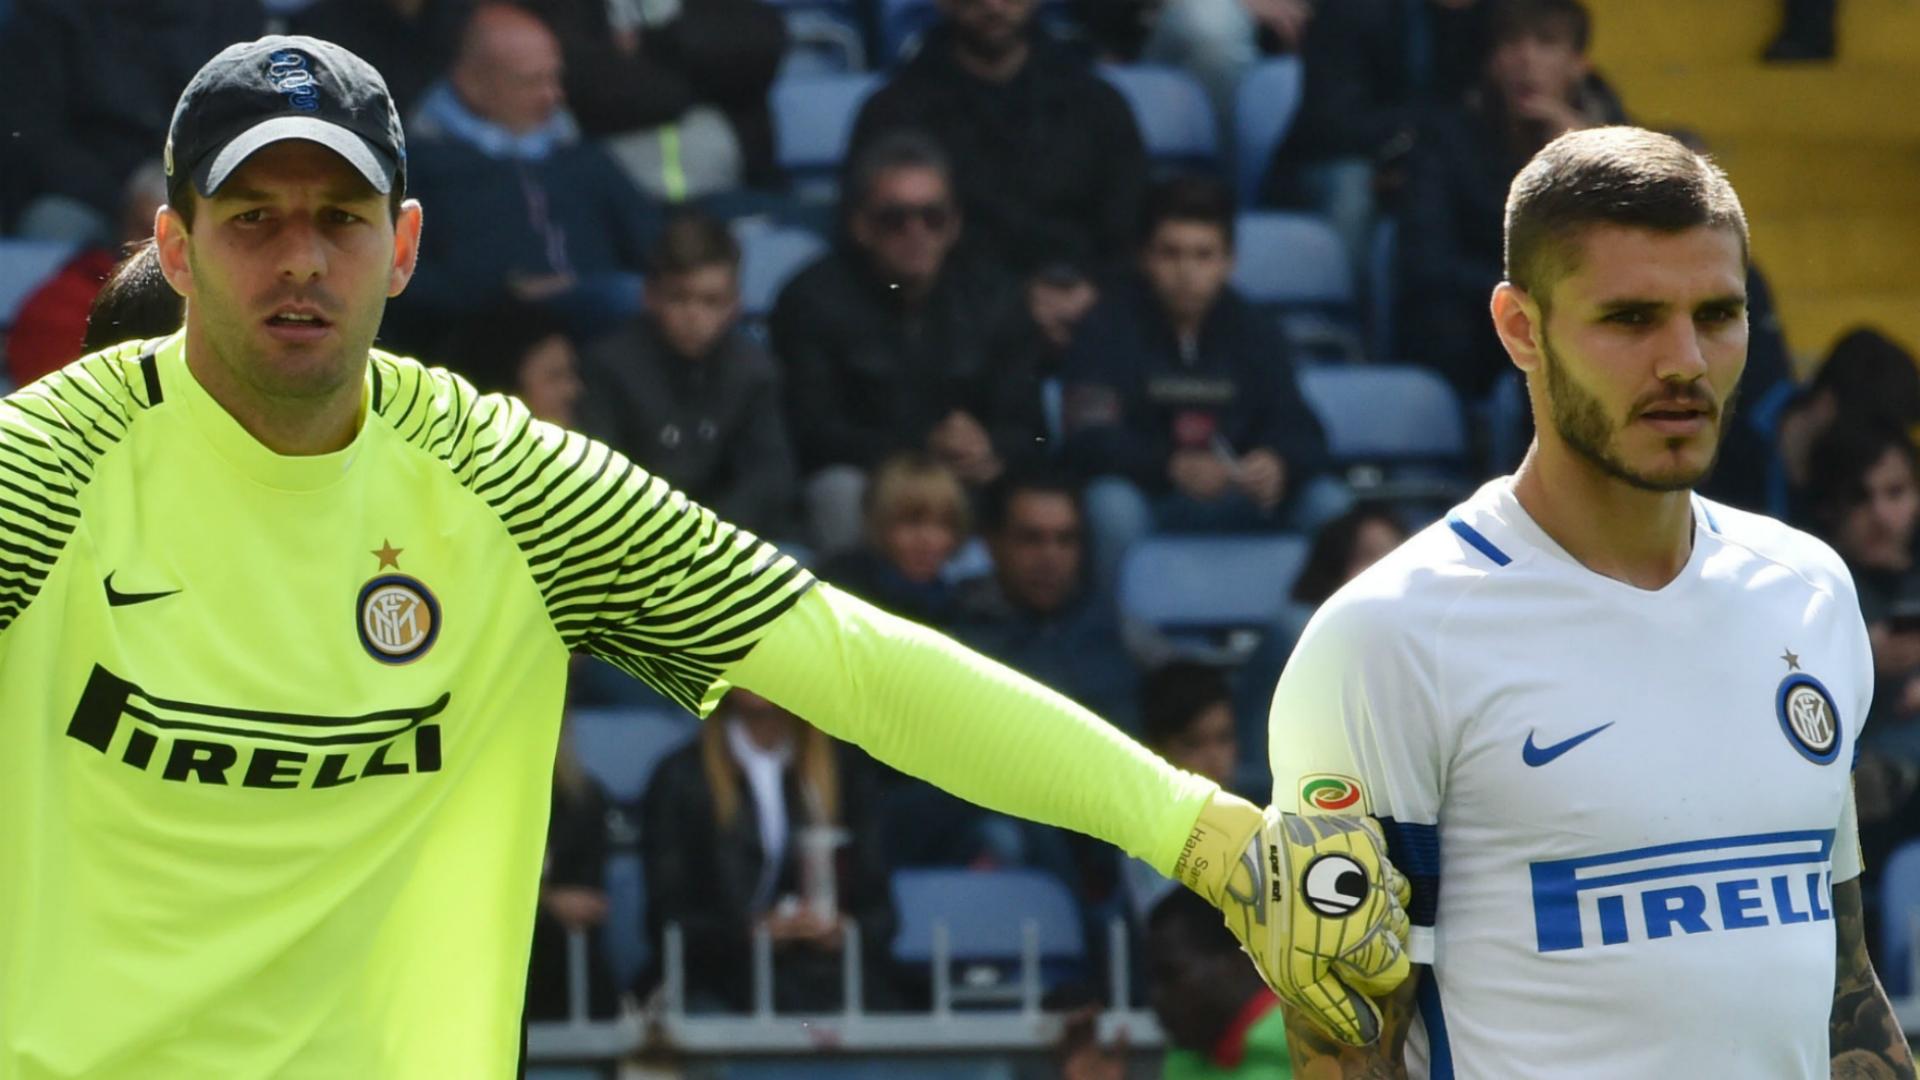 Players have duties - Inter captain Handanovic warns Icardi